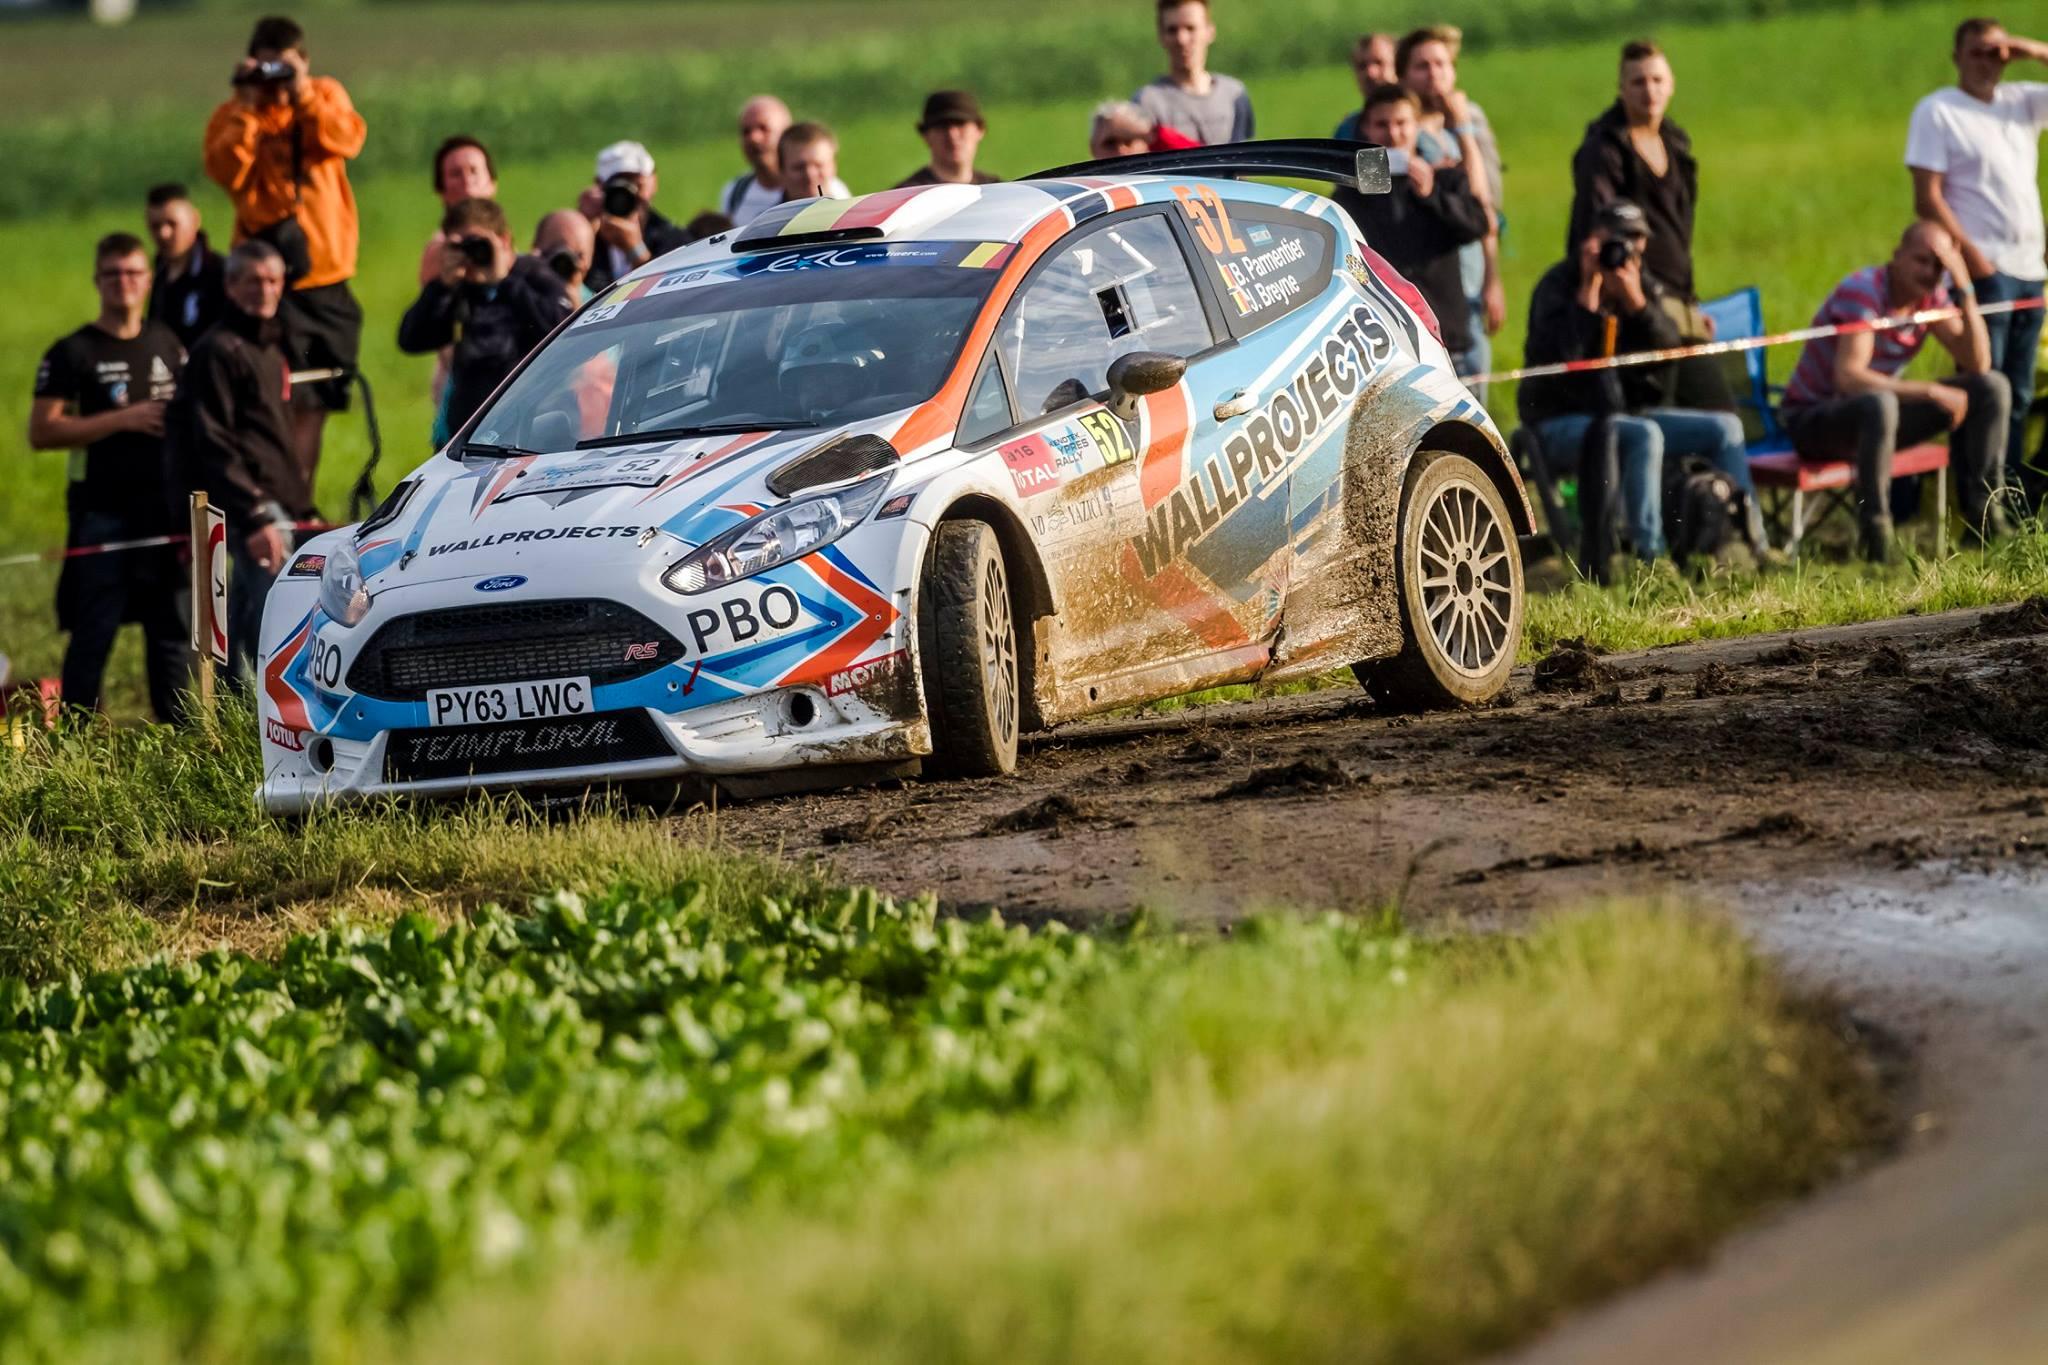 Rallye ypres 2019